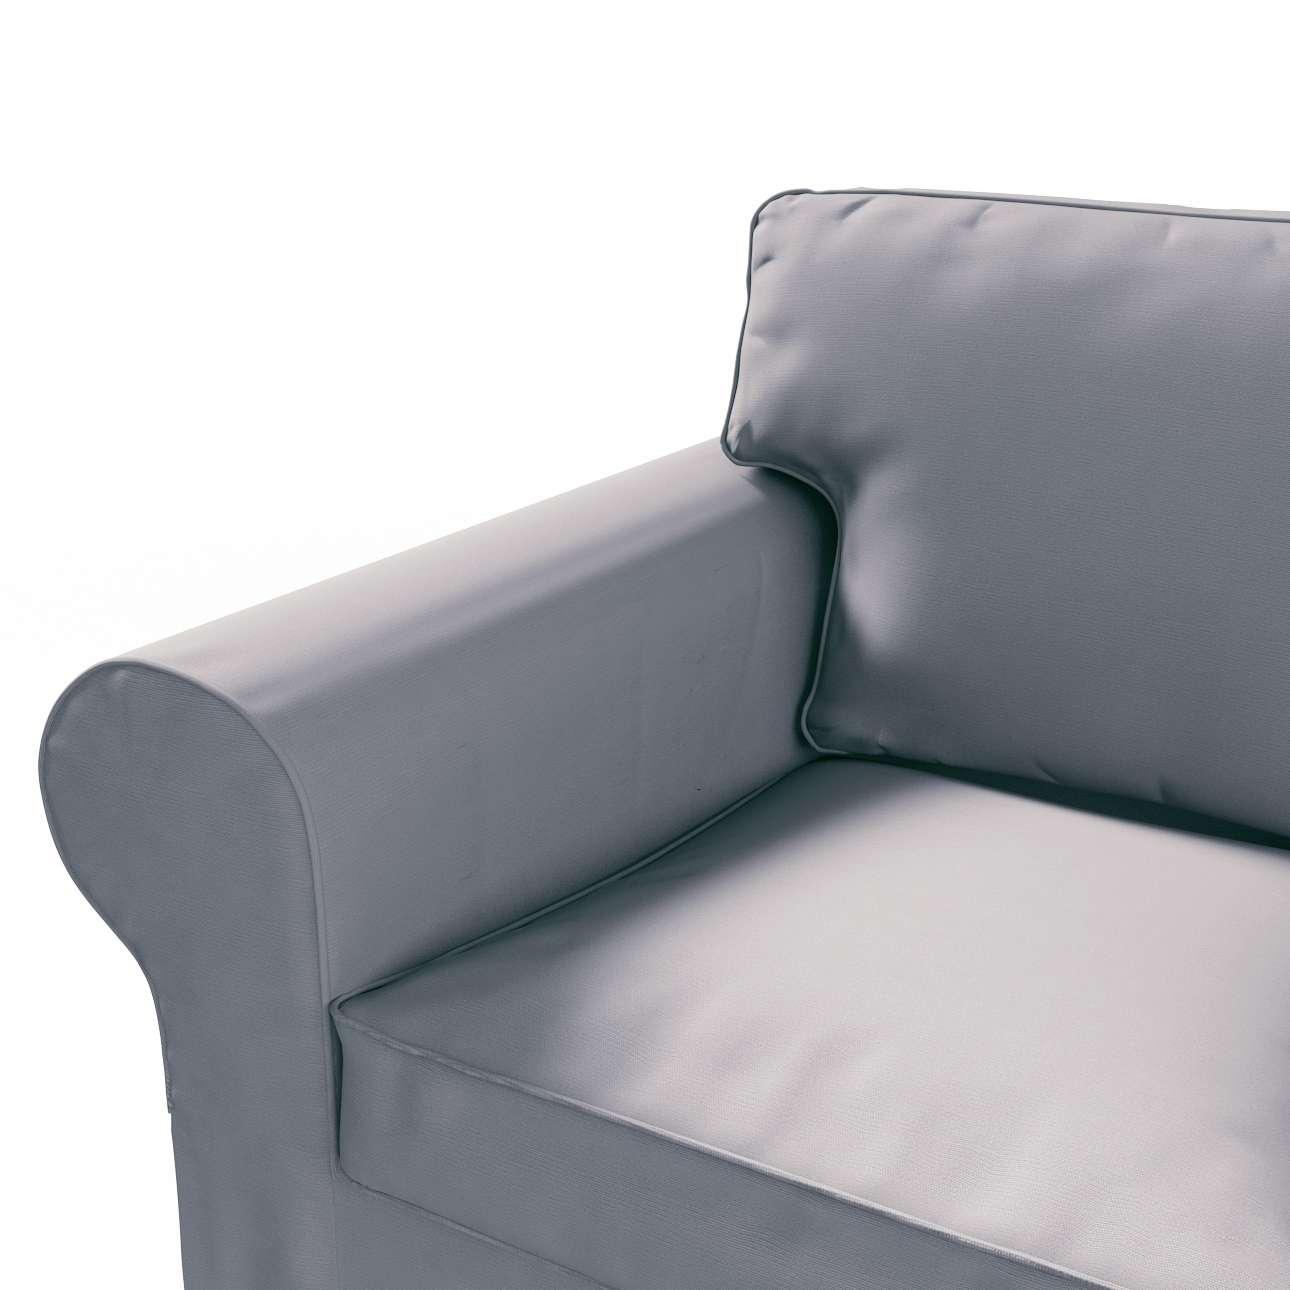 Ektorp 2-Sitzer Schlafsofabezug  ALTES Modell Sofabezug Ektorp 2-Sitzer Schlafsofa altes Modell von der Kollektion Cotton Panama, Stoff: 702-07